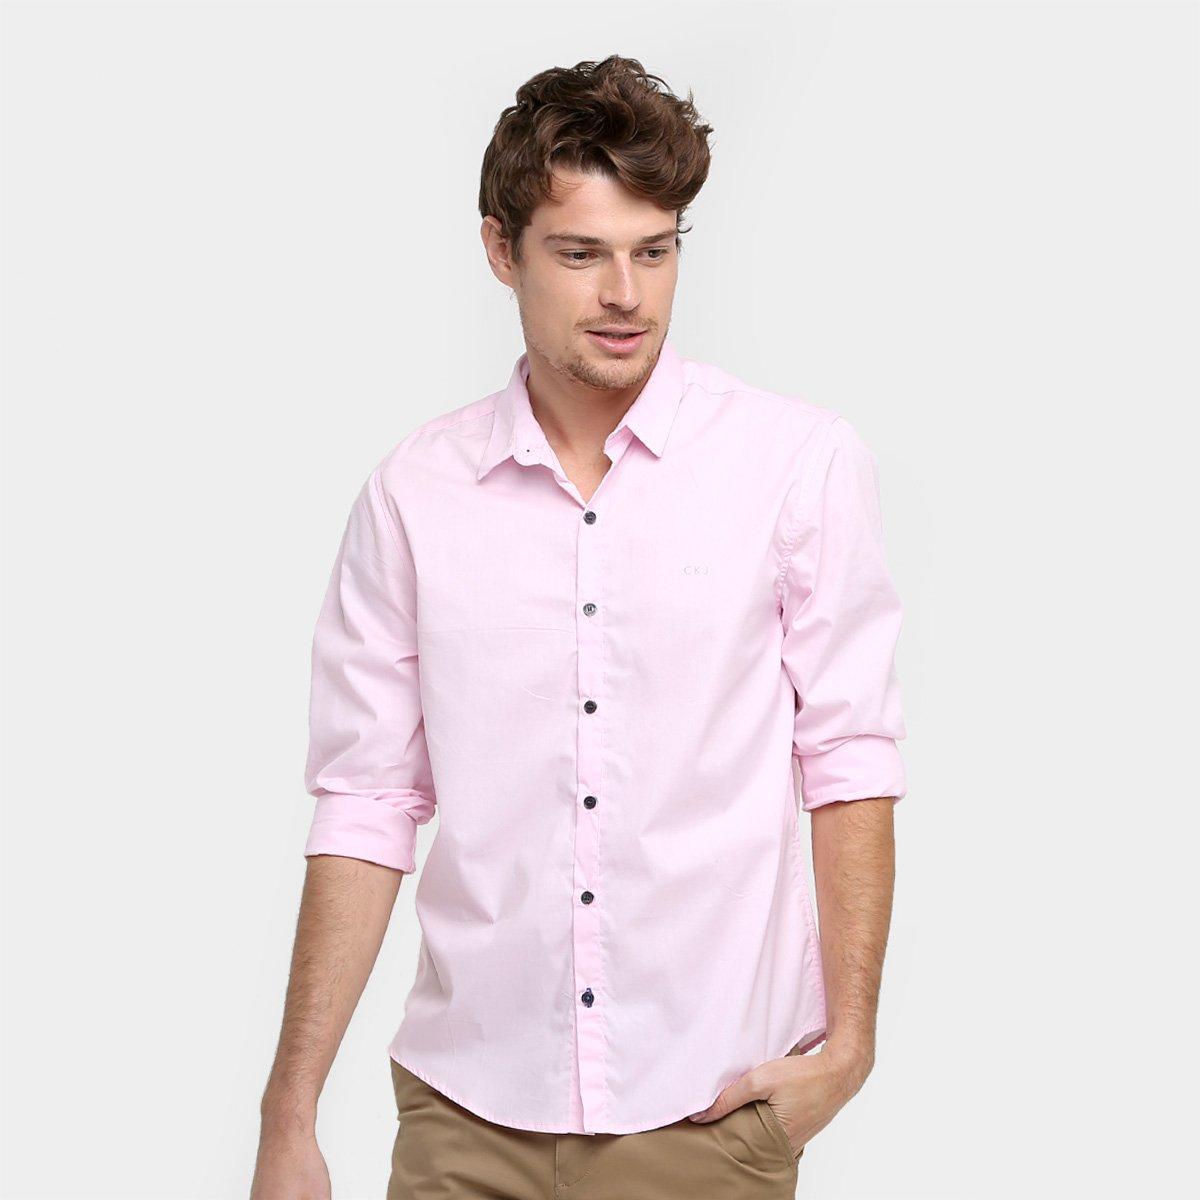 Camisa Social Calvin Klein Slim Fit Manga Longa Masculina - Compre ... b93a685c3d509